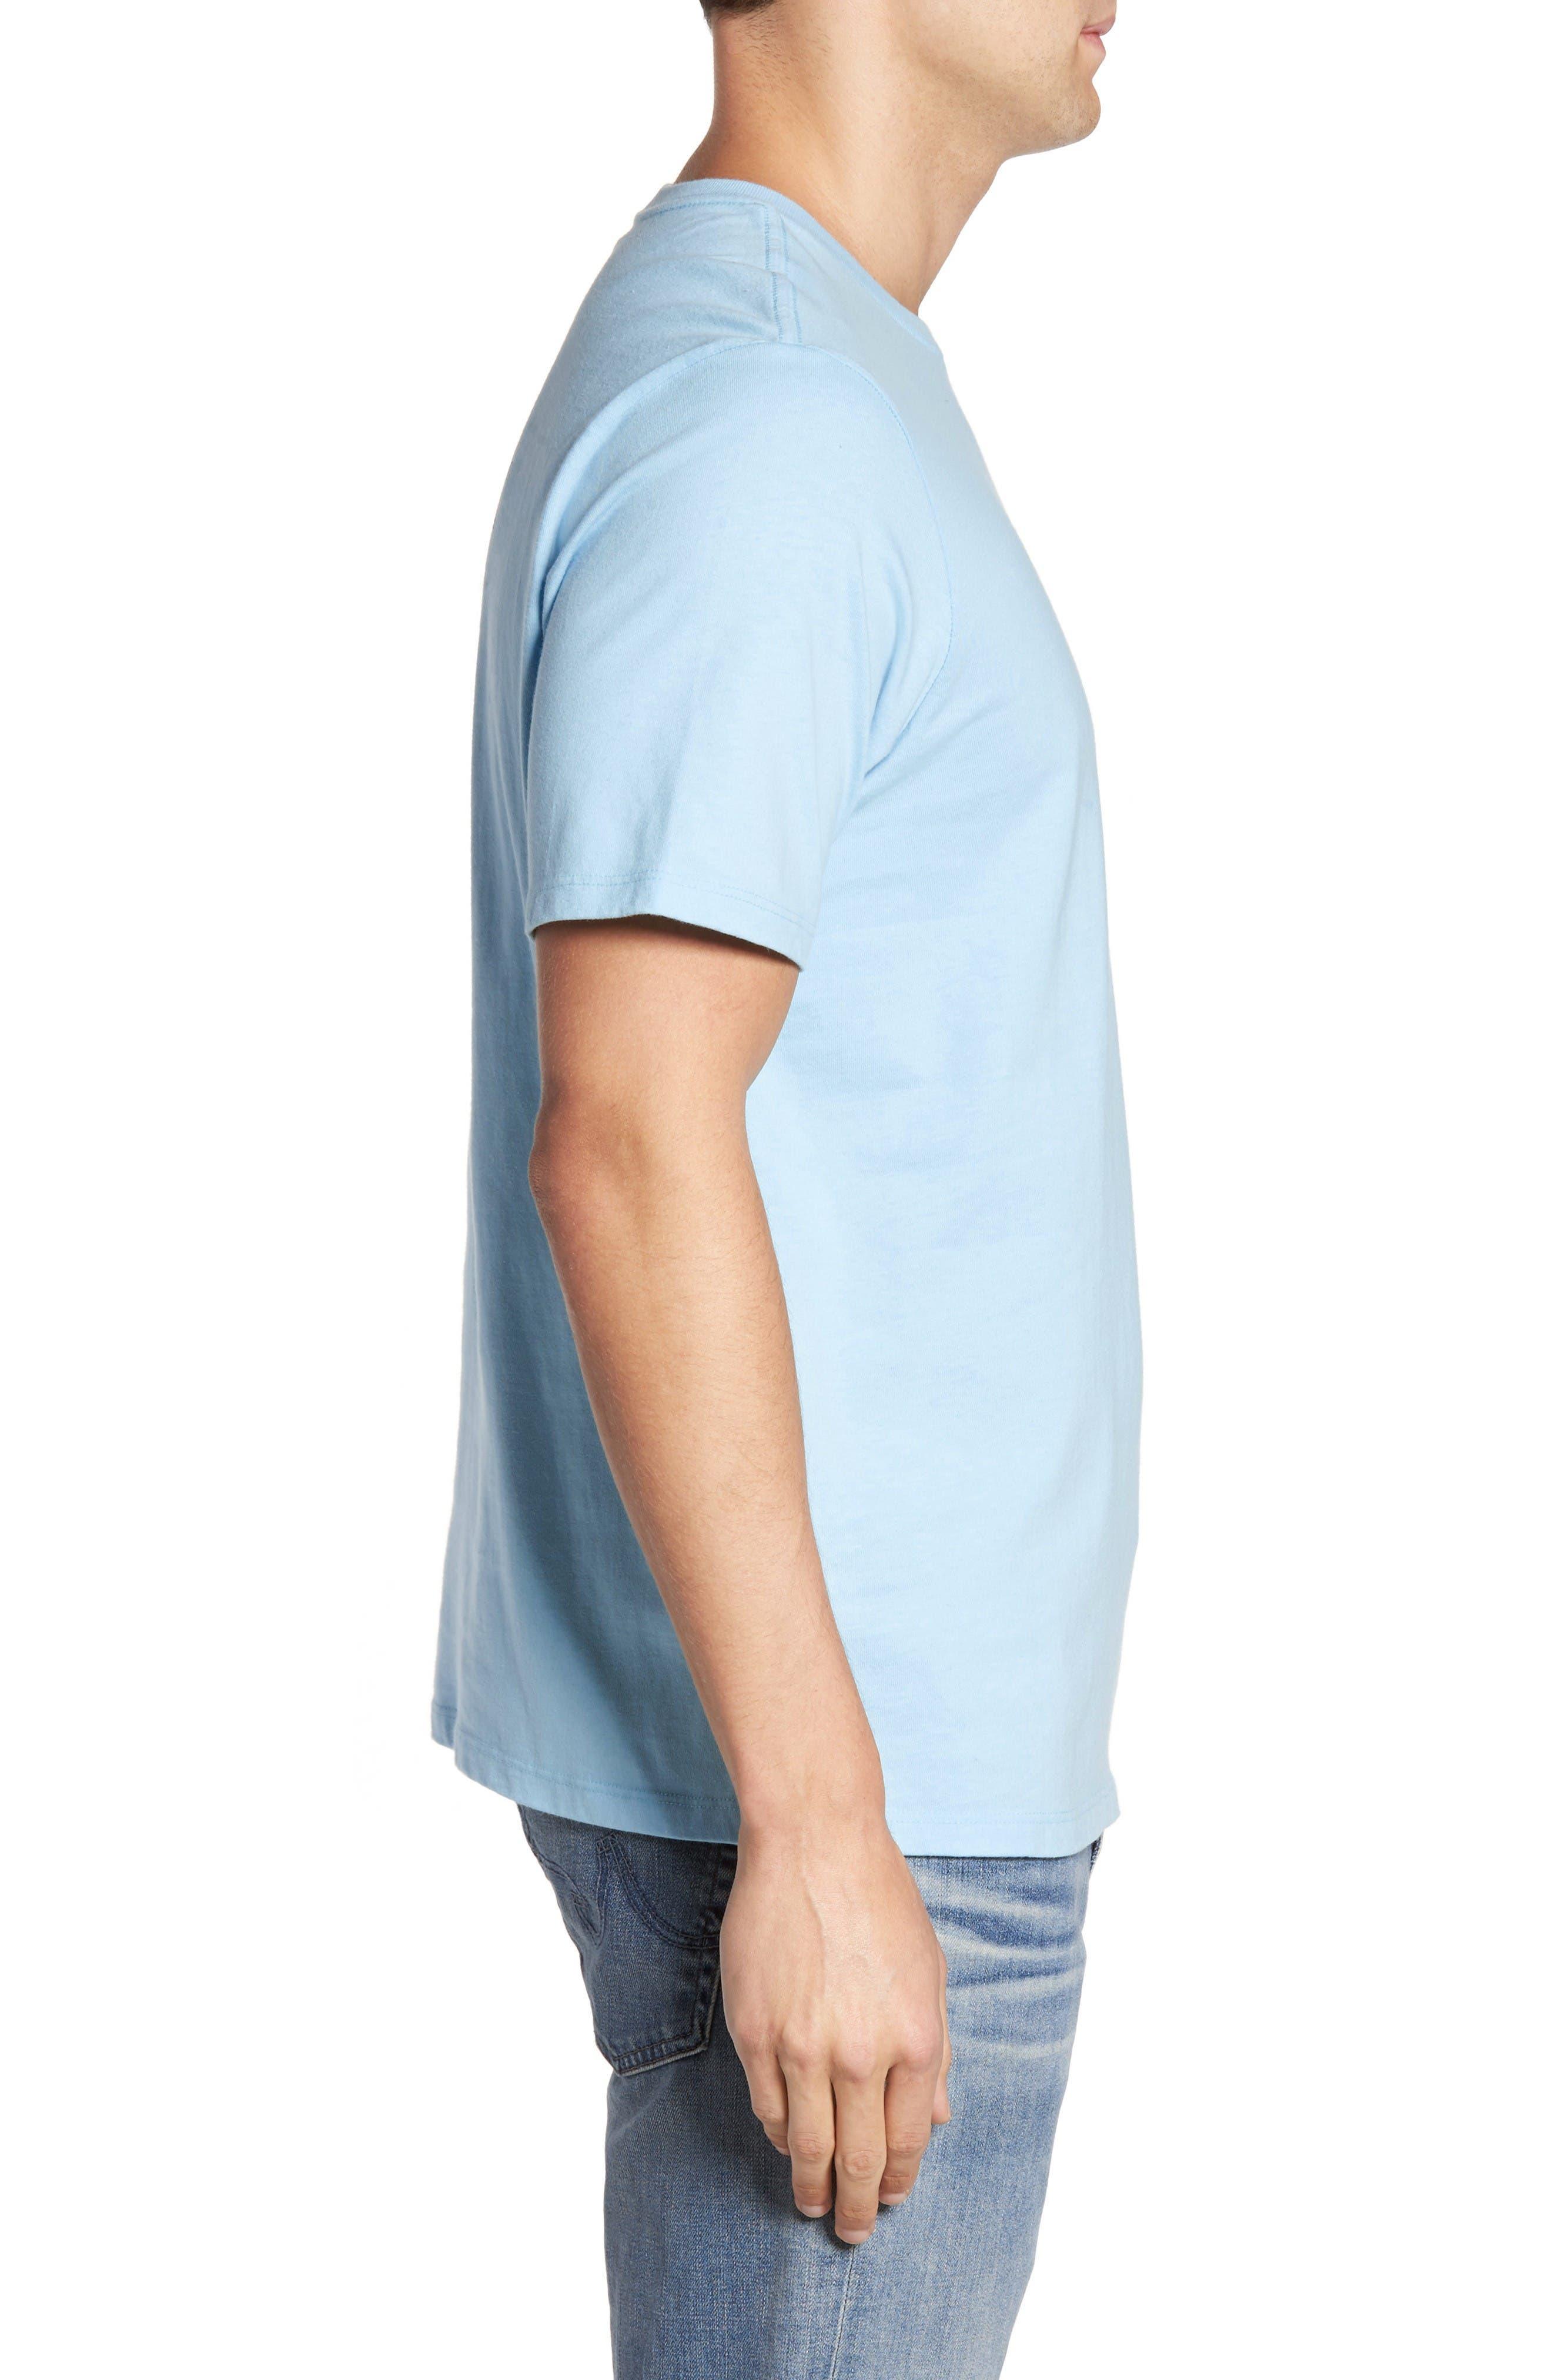 Mr. Ice Guy T-Shirt,                             Alternate thumbnail 3, color,                             Graceful Sea